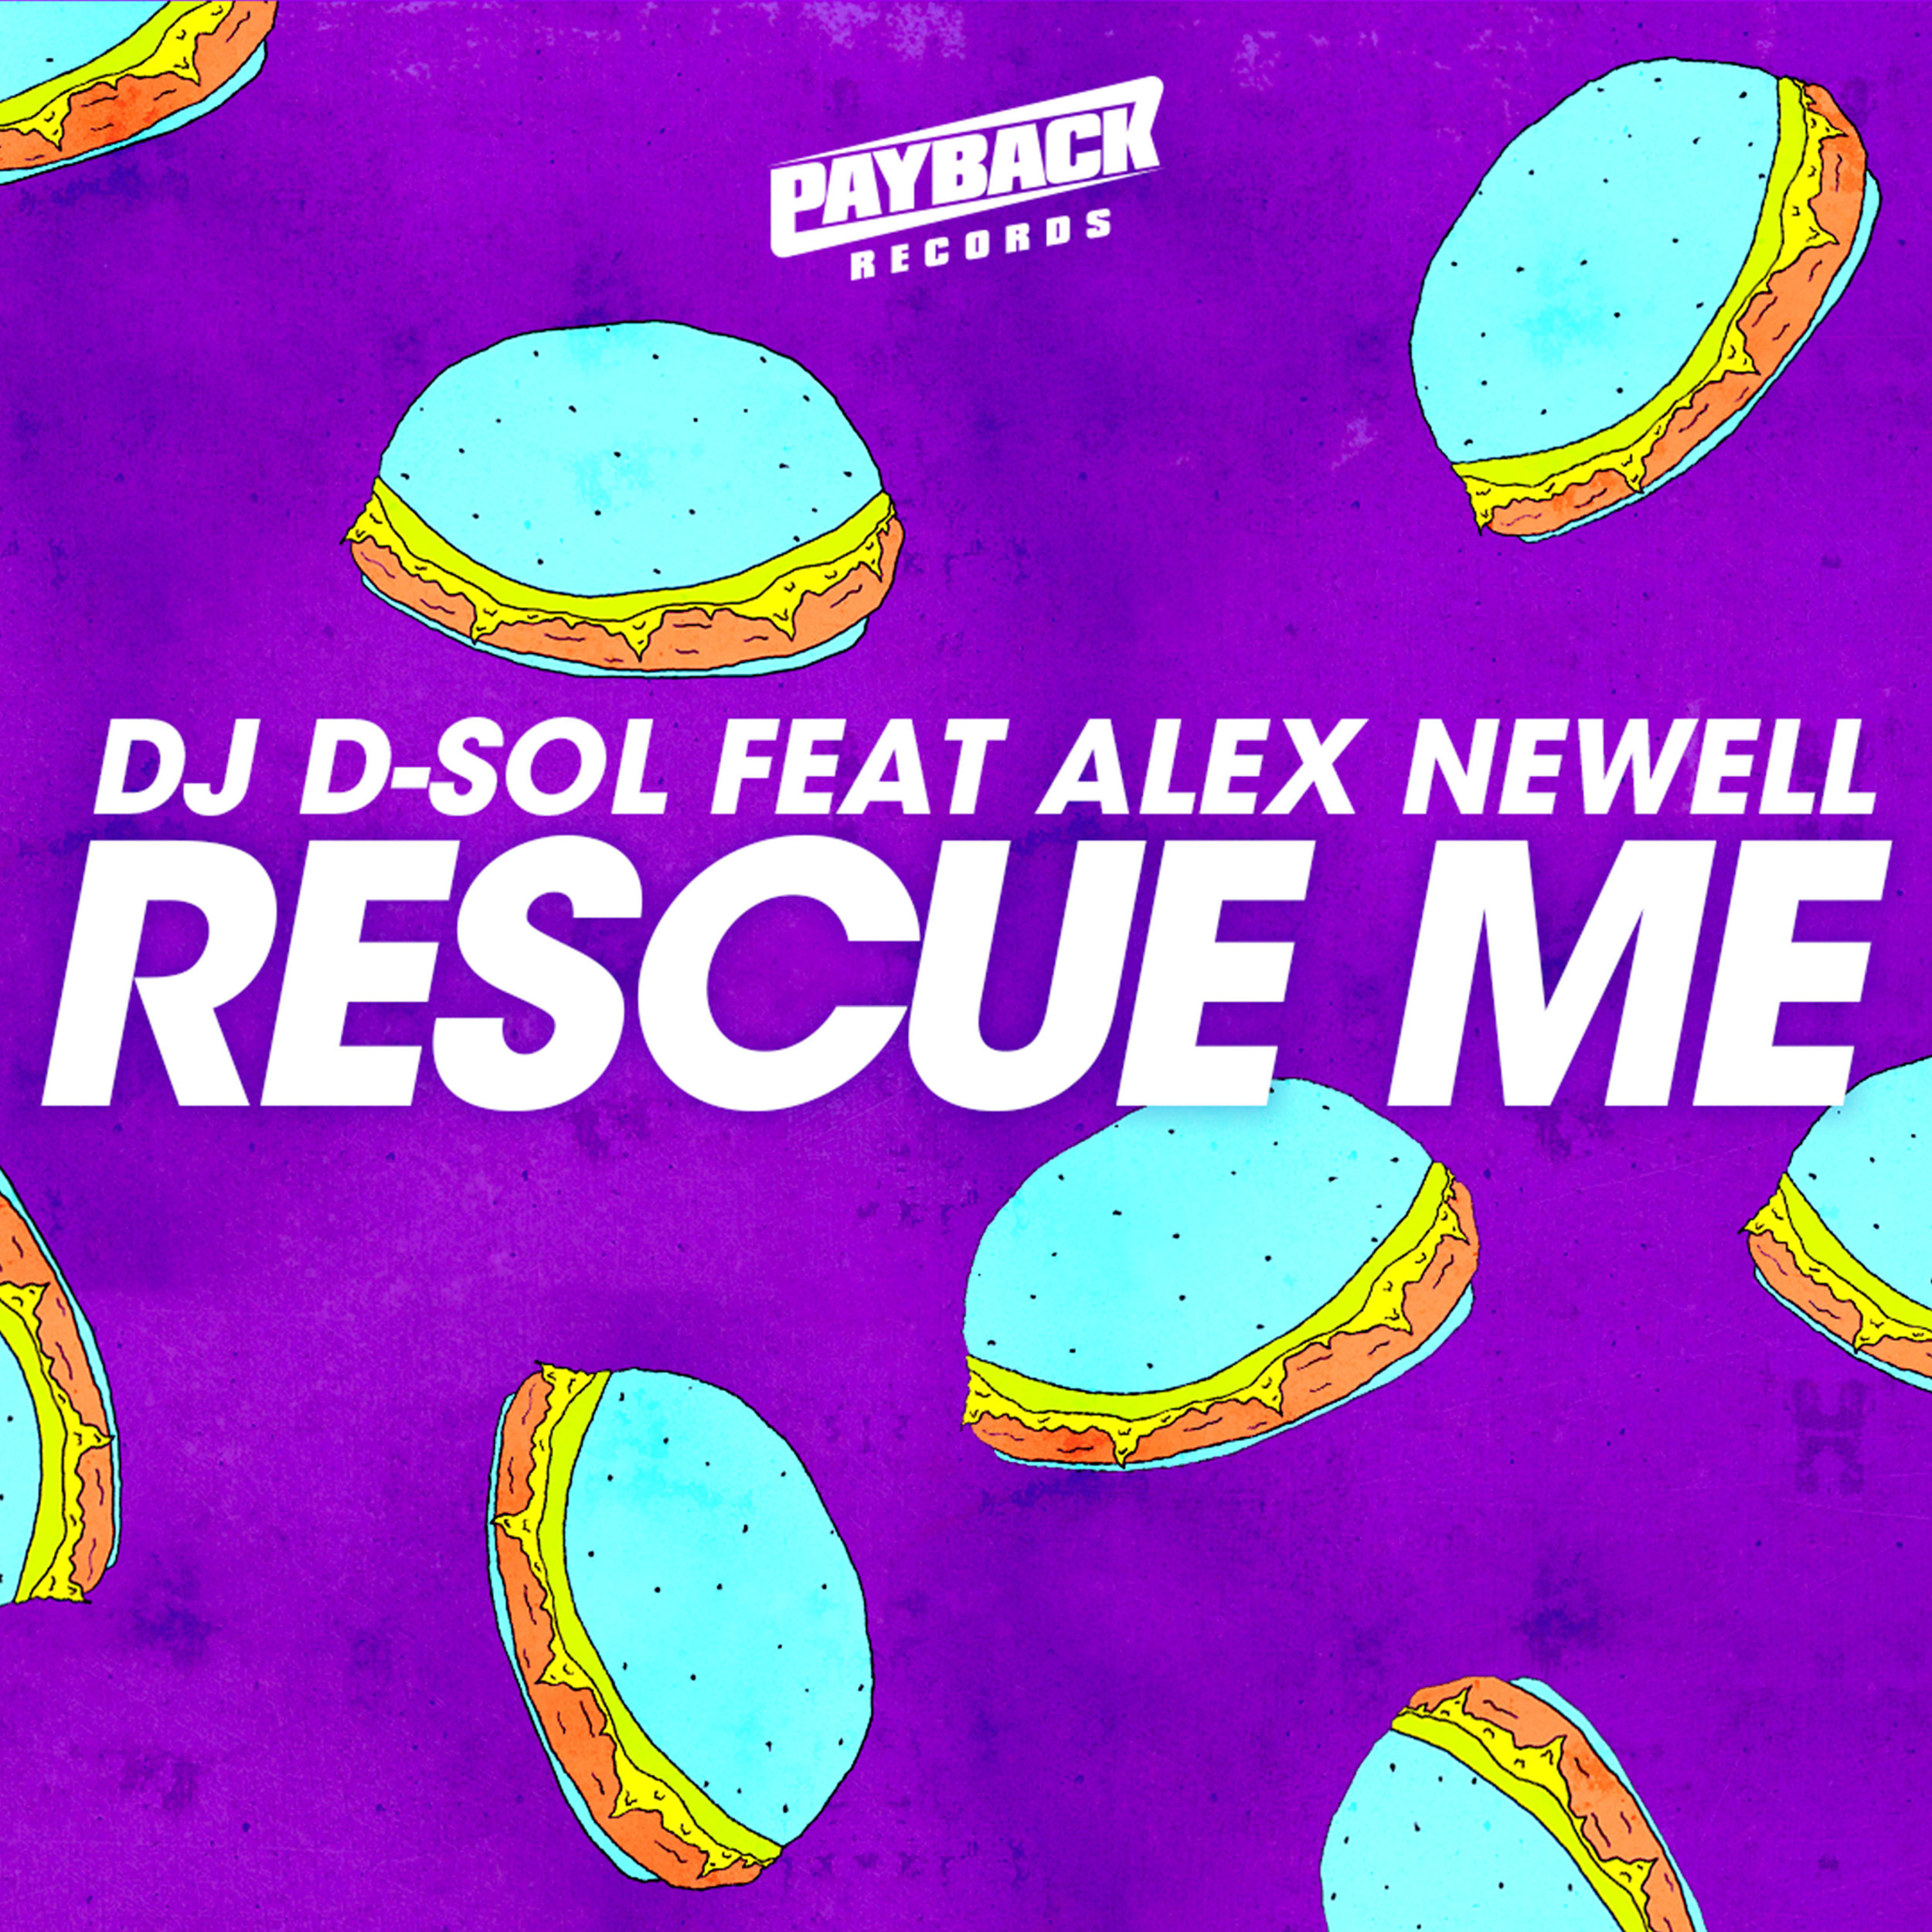 DJ D-Sol_Rescue Me_Cover Art_3K-x-3K.jpg